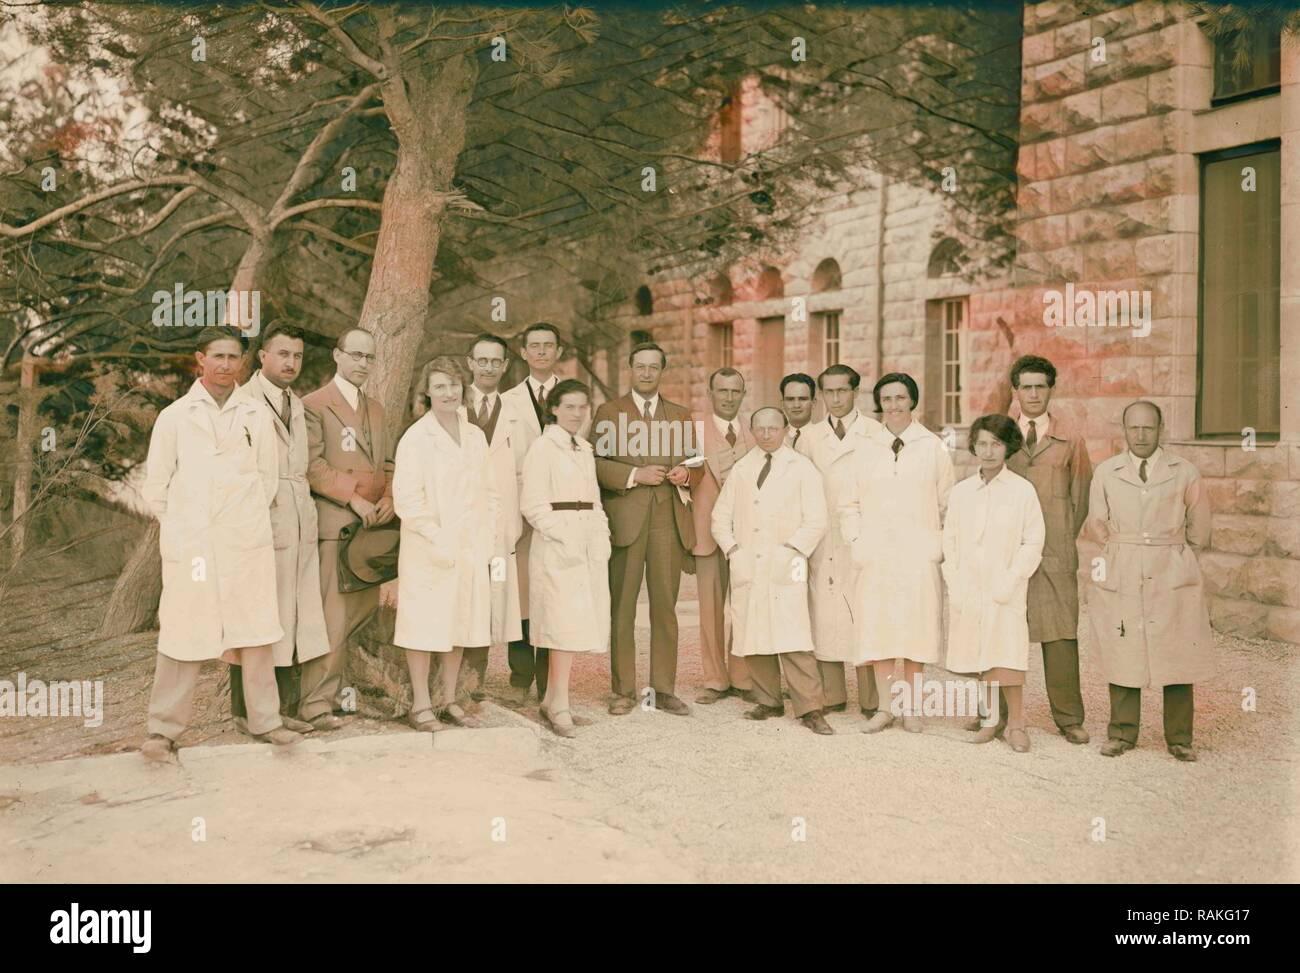 Zionist activities in Palestine. Members of the Hebrew University staff. 1925, Jerusalem. Reimagined - Stock Image